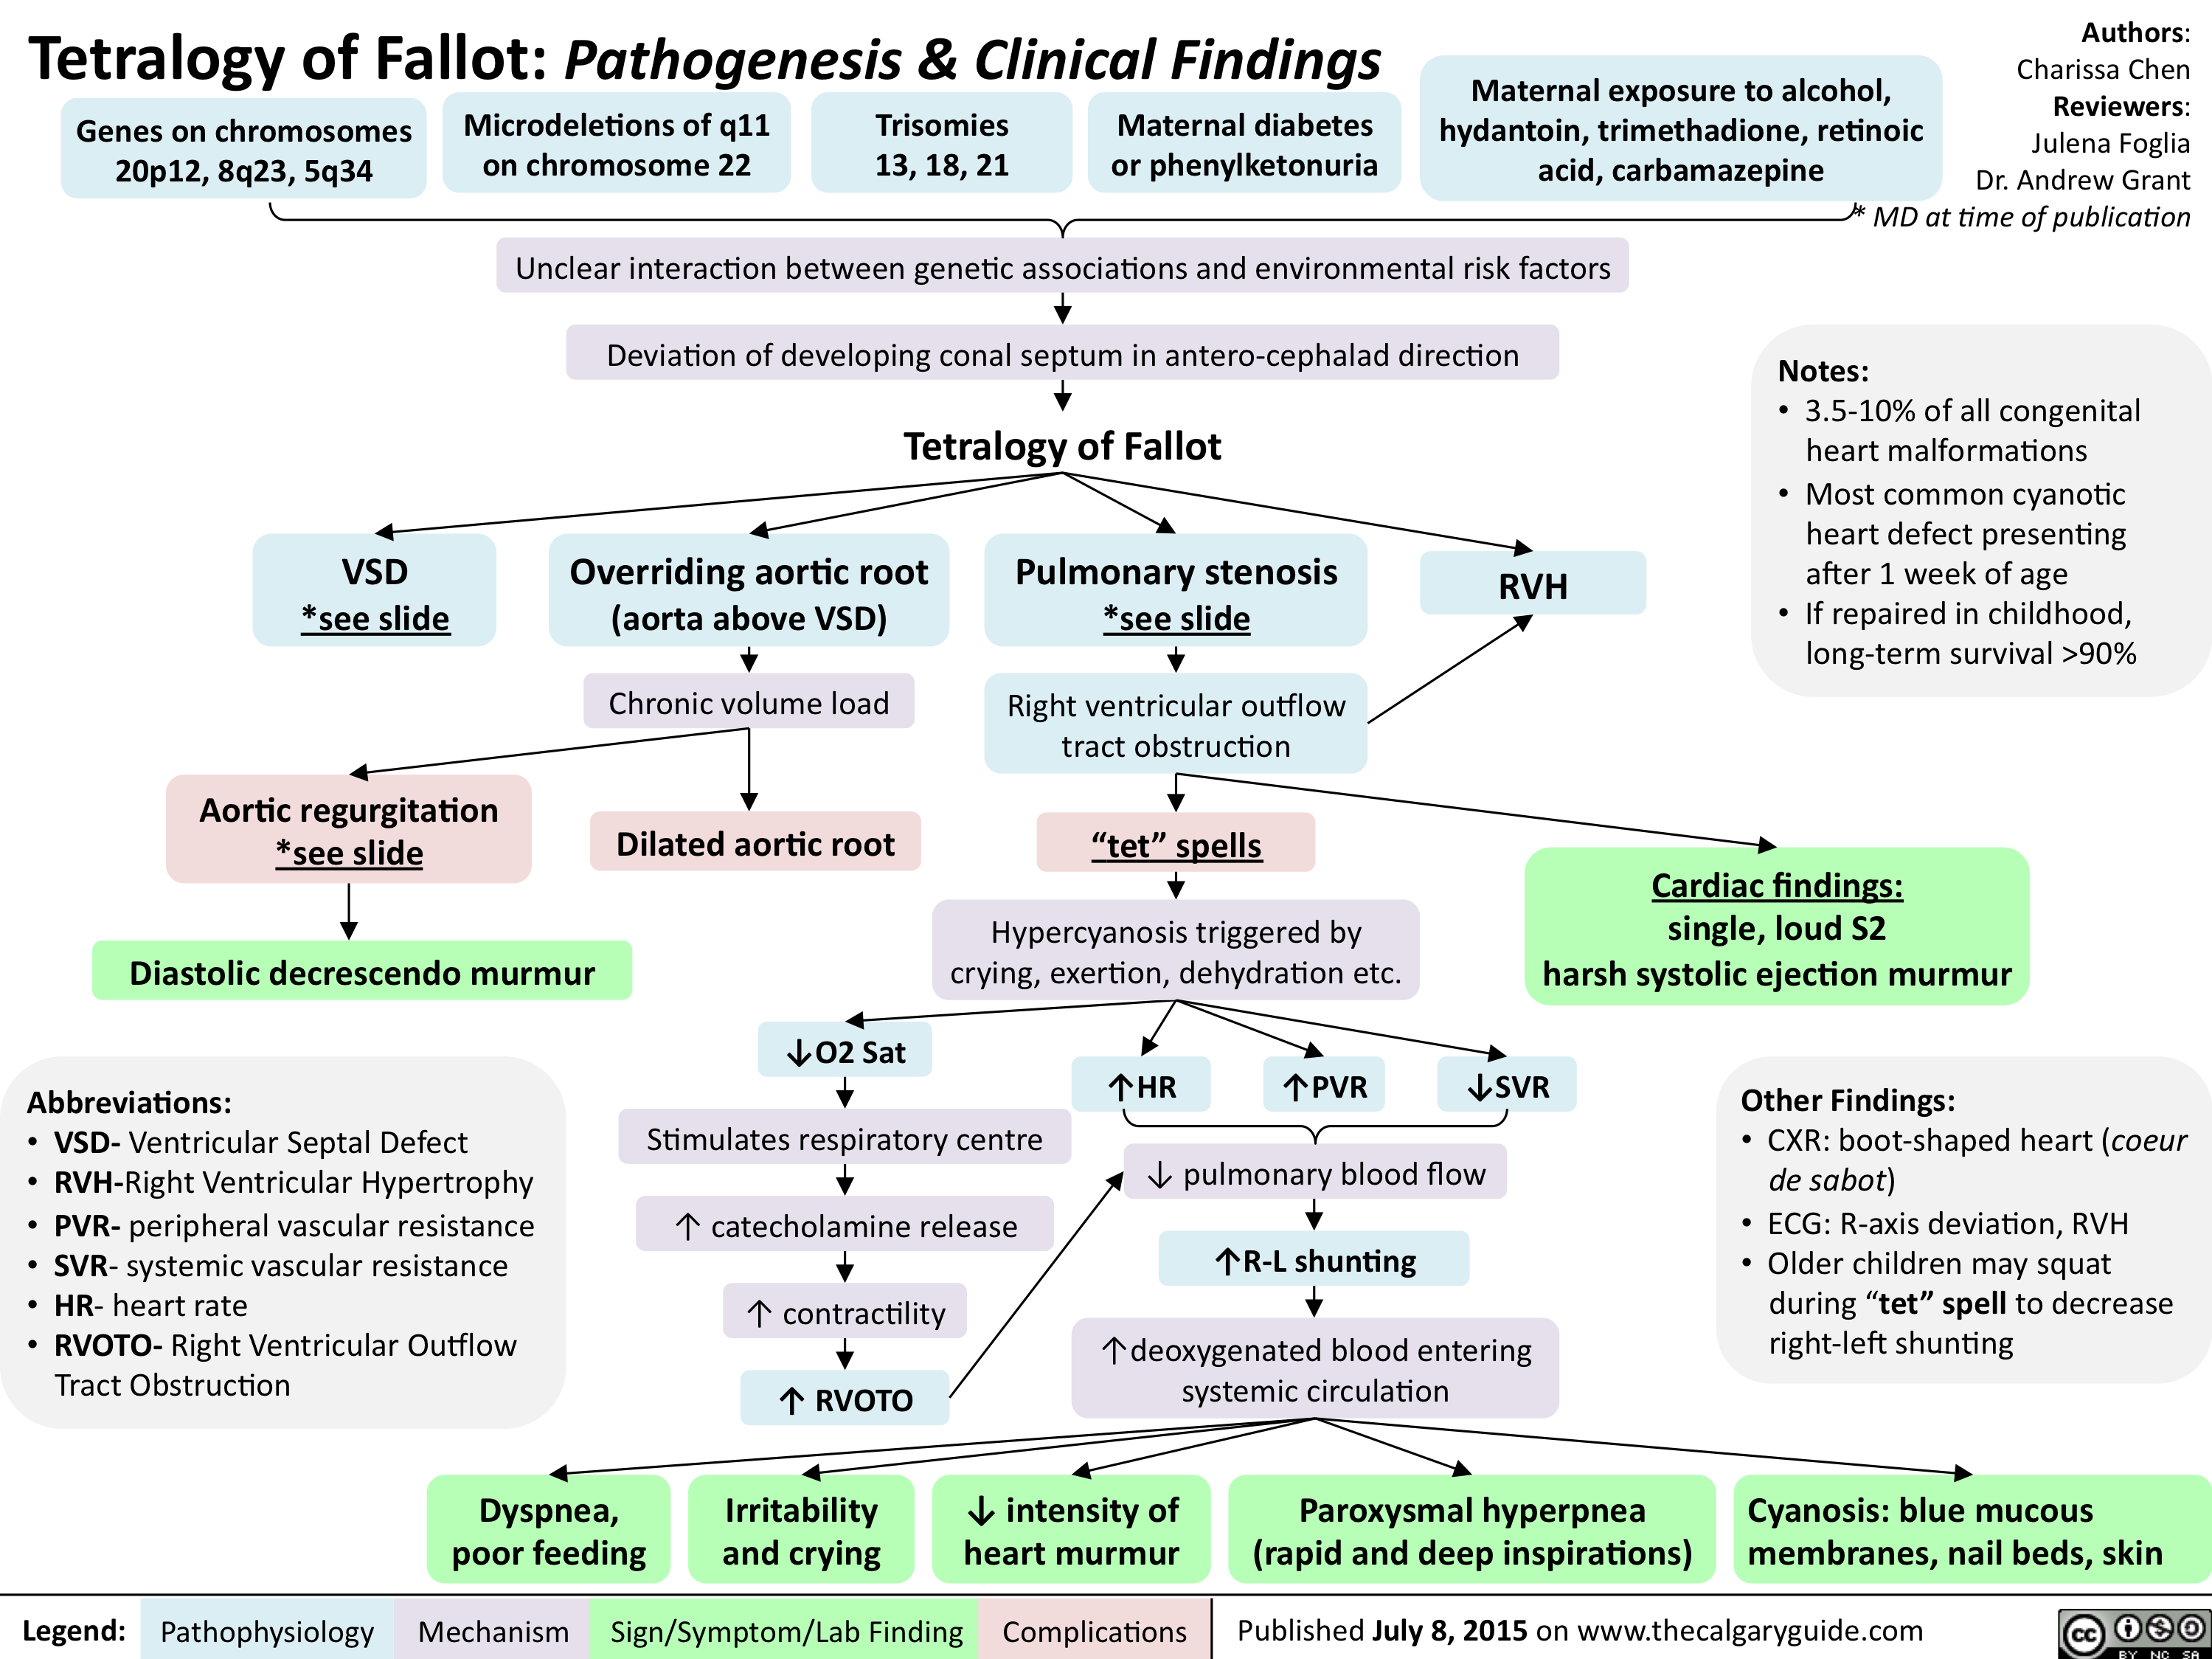 Tetralogy of Fallot-Pathogenesis & Clinical Findings ... on nephrotic syndrome pathophysiology, retinopathy of prematurity pathophysiology, typhoid fever pathophysiology, chronic obstructive pulmonary disease pathophysiology, cardiac tamponade pathophysiology, mitral valve stenosis pathophysiology, cushing's syndrome pathophysiology, sarcoidosis pathophysiology, bronchiolitis pathophysiology, mitral valve regurgitation pathophysiology, atrial flutter pathophysiology, ankylosing spondylitis pathophysiology, unstable angina pathophysiology, aspiration pneumonia pathophysiology, cardiogenic shock pathophysiology, umbilical hernia pathophysiology, pleural effusion pathophysiology, meningitis pathophysiology, aortic stenosis pathophysiology, alzheimer's disease pathophysiology,